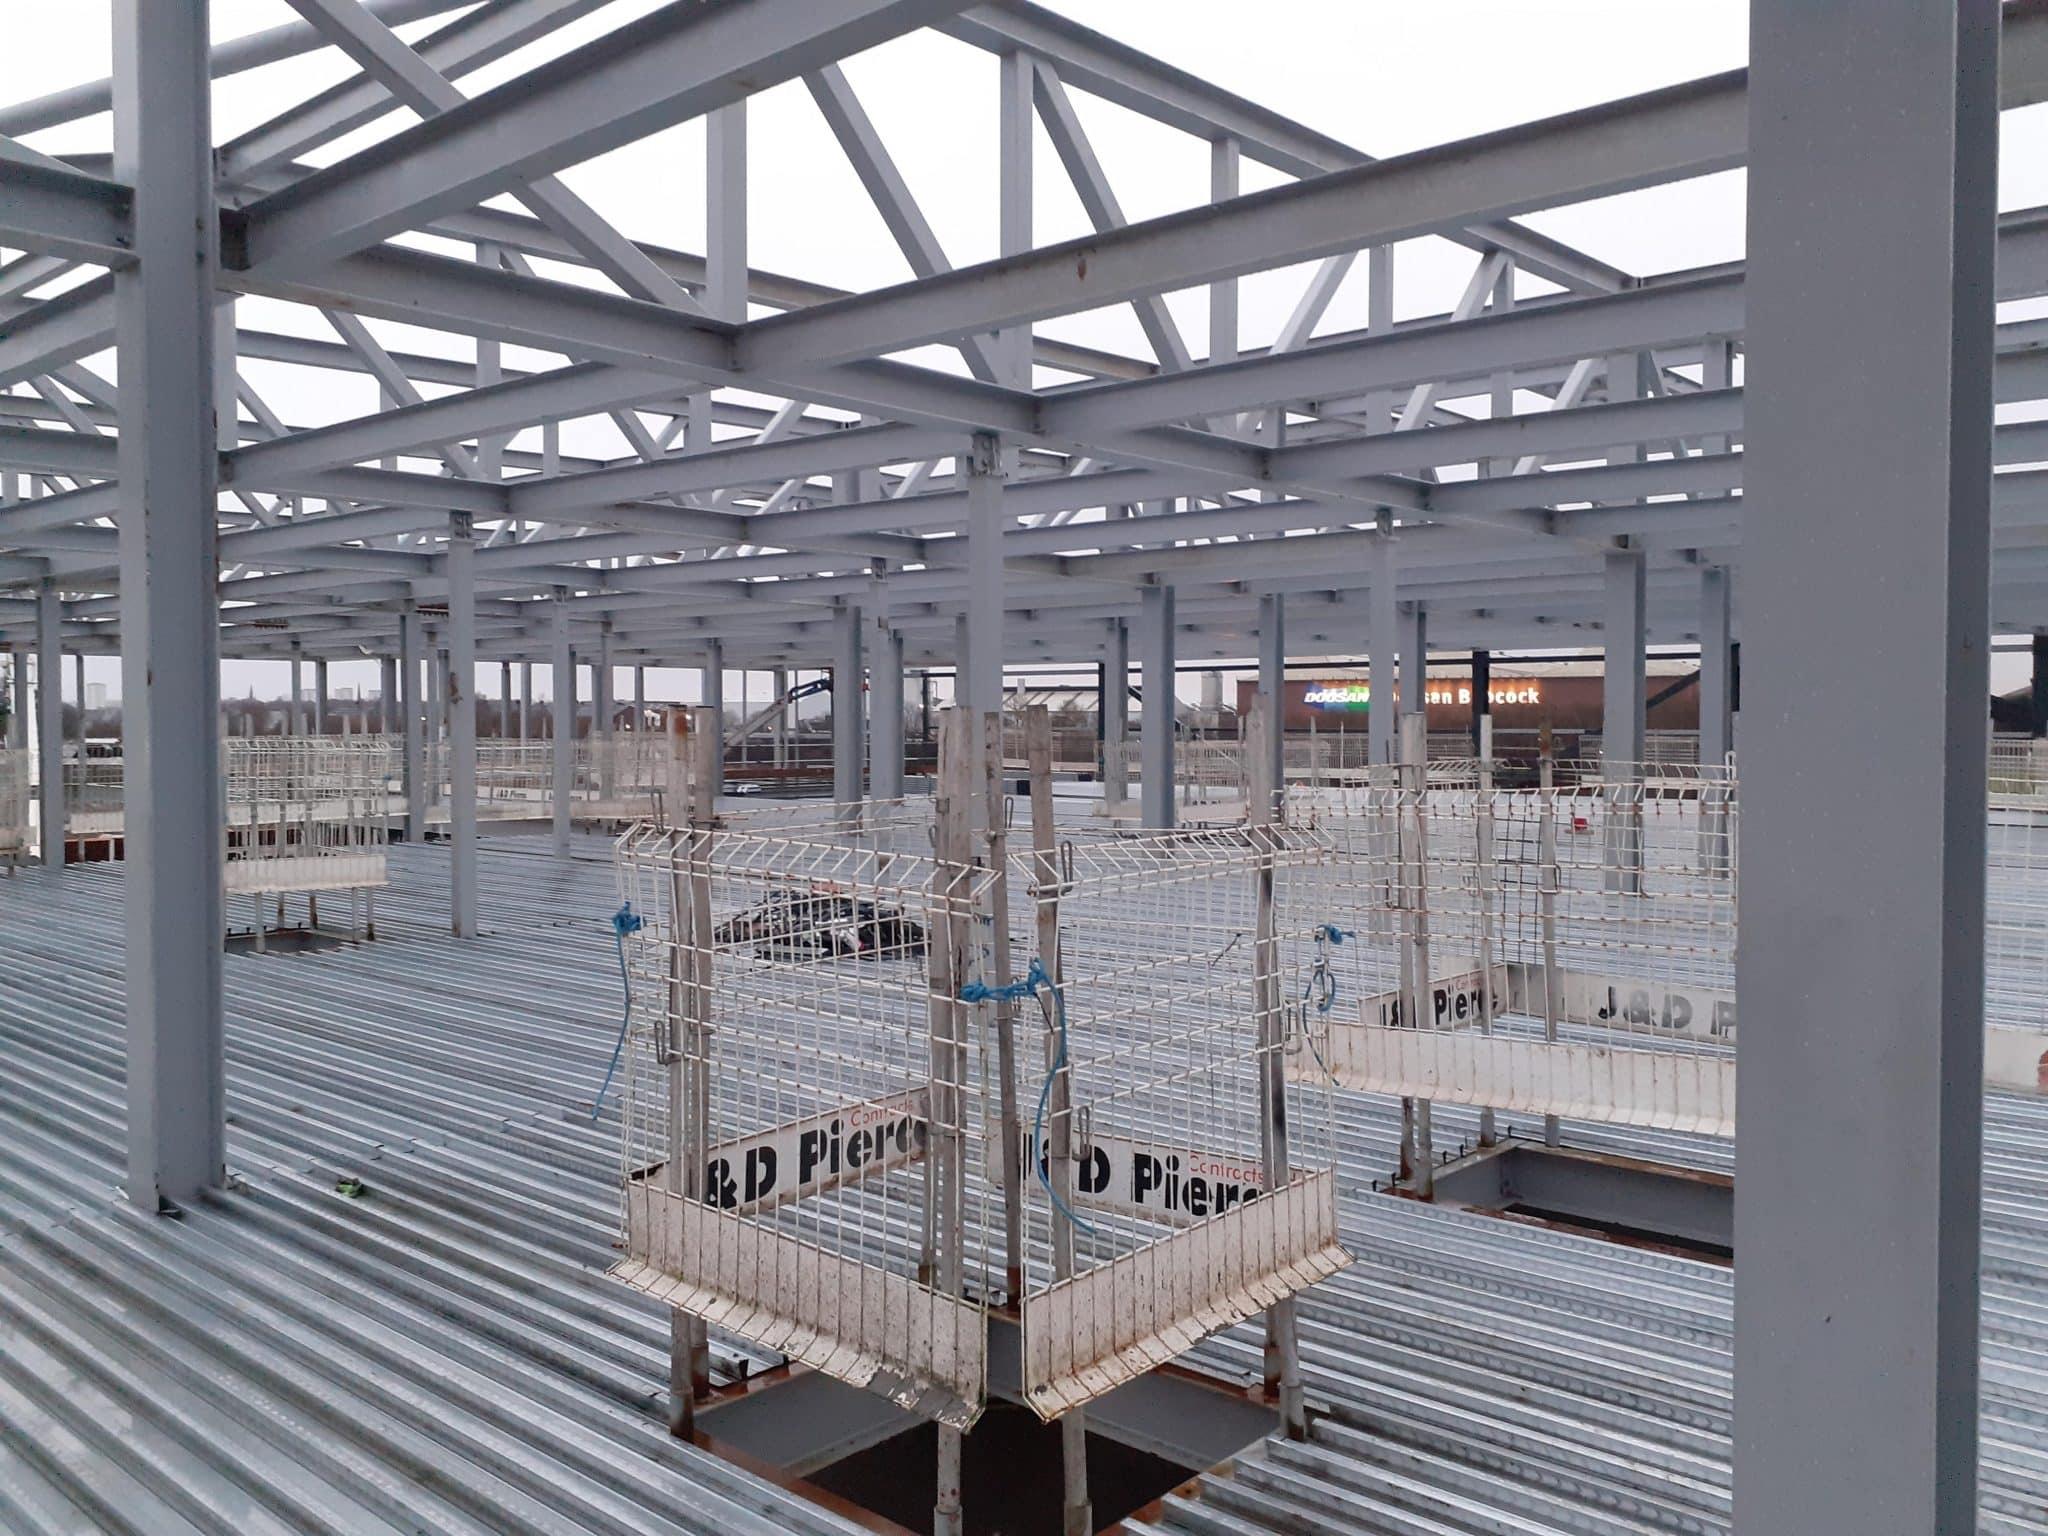 MMIC Steel Structure - JDPierce